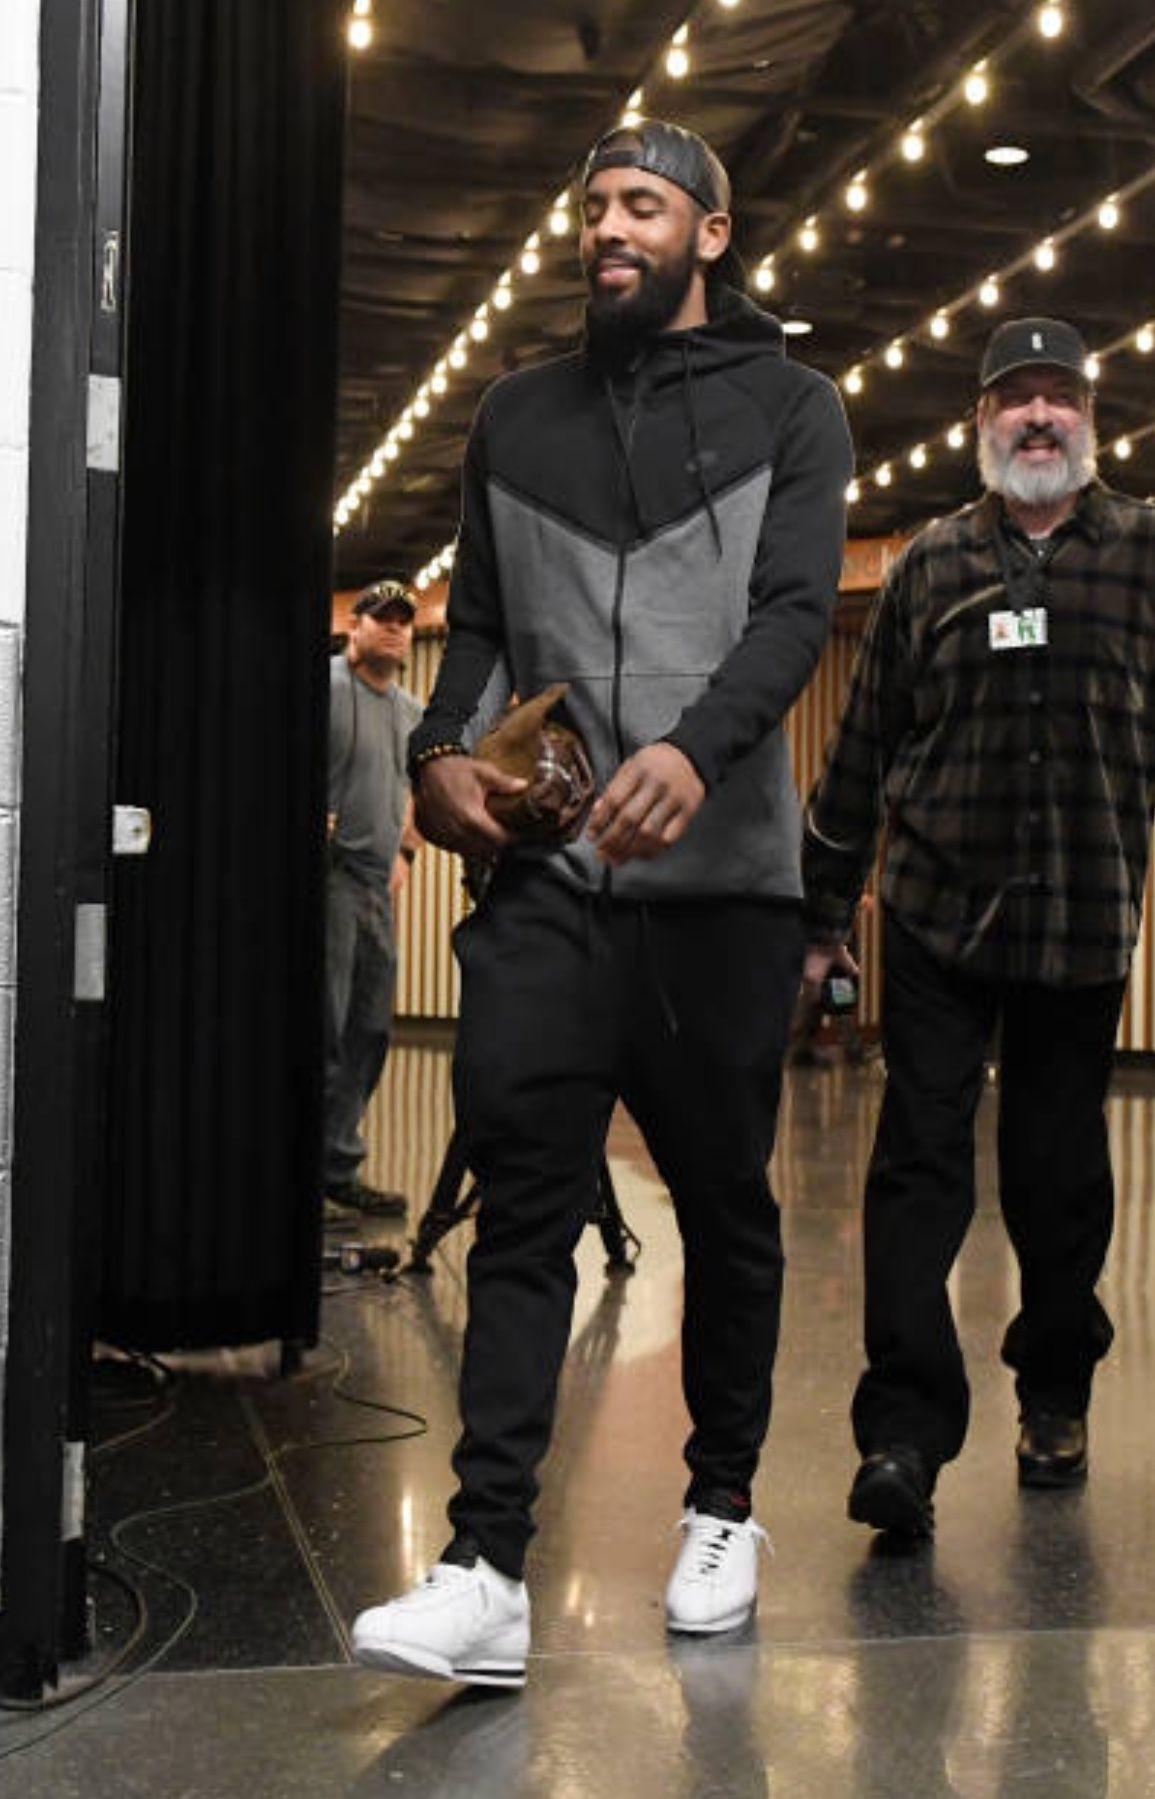 super popular cec7a 4aa65 Looks like #KyrieIrving has on the Kendrick Lamar x #Nike ...